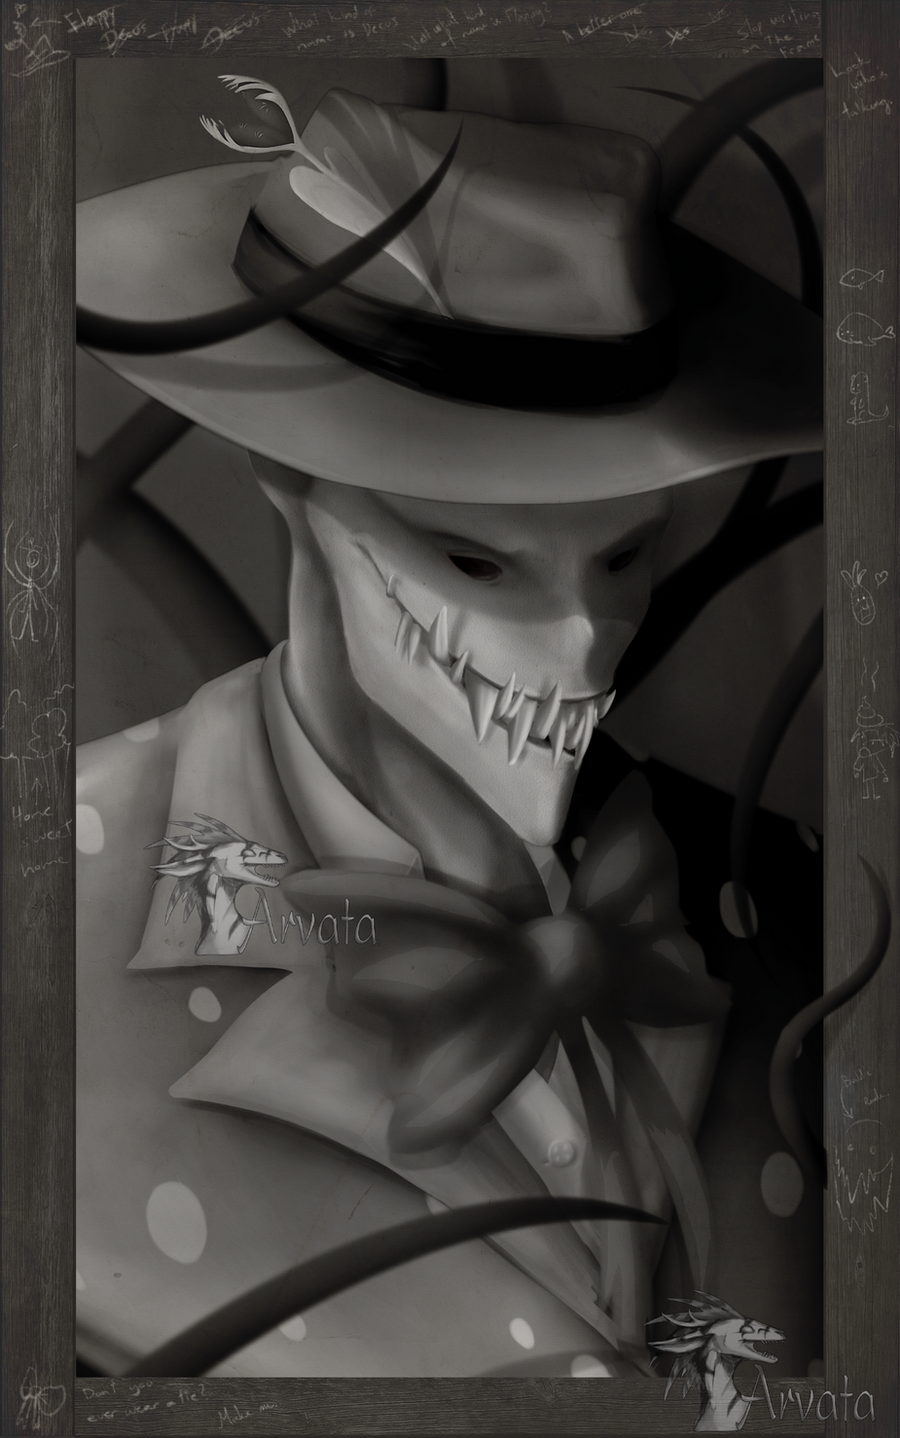 Creepy Splendorman by Arvata